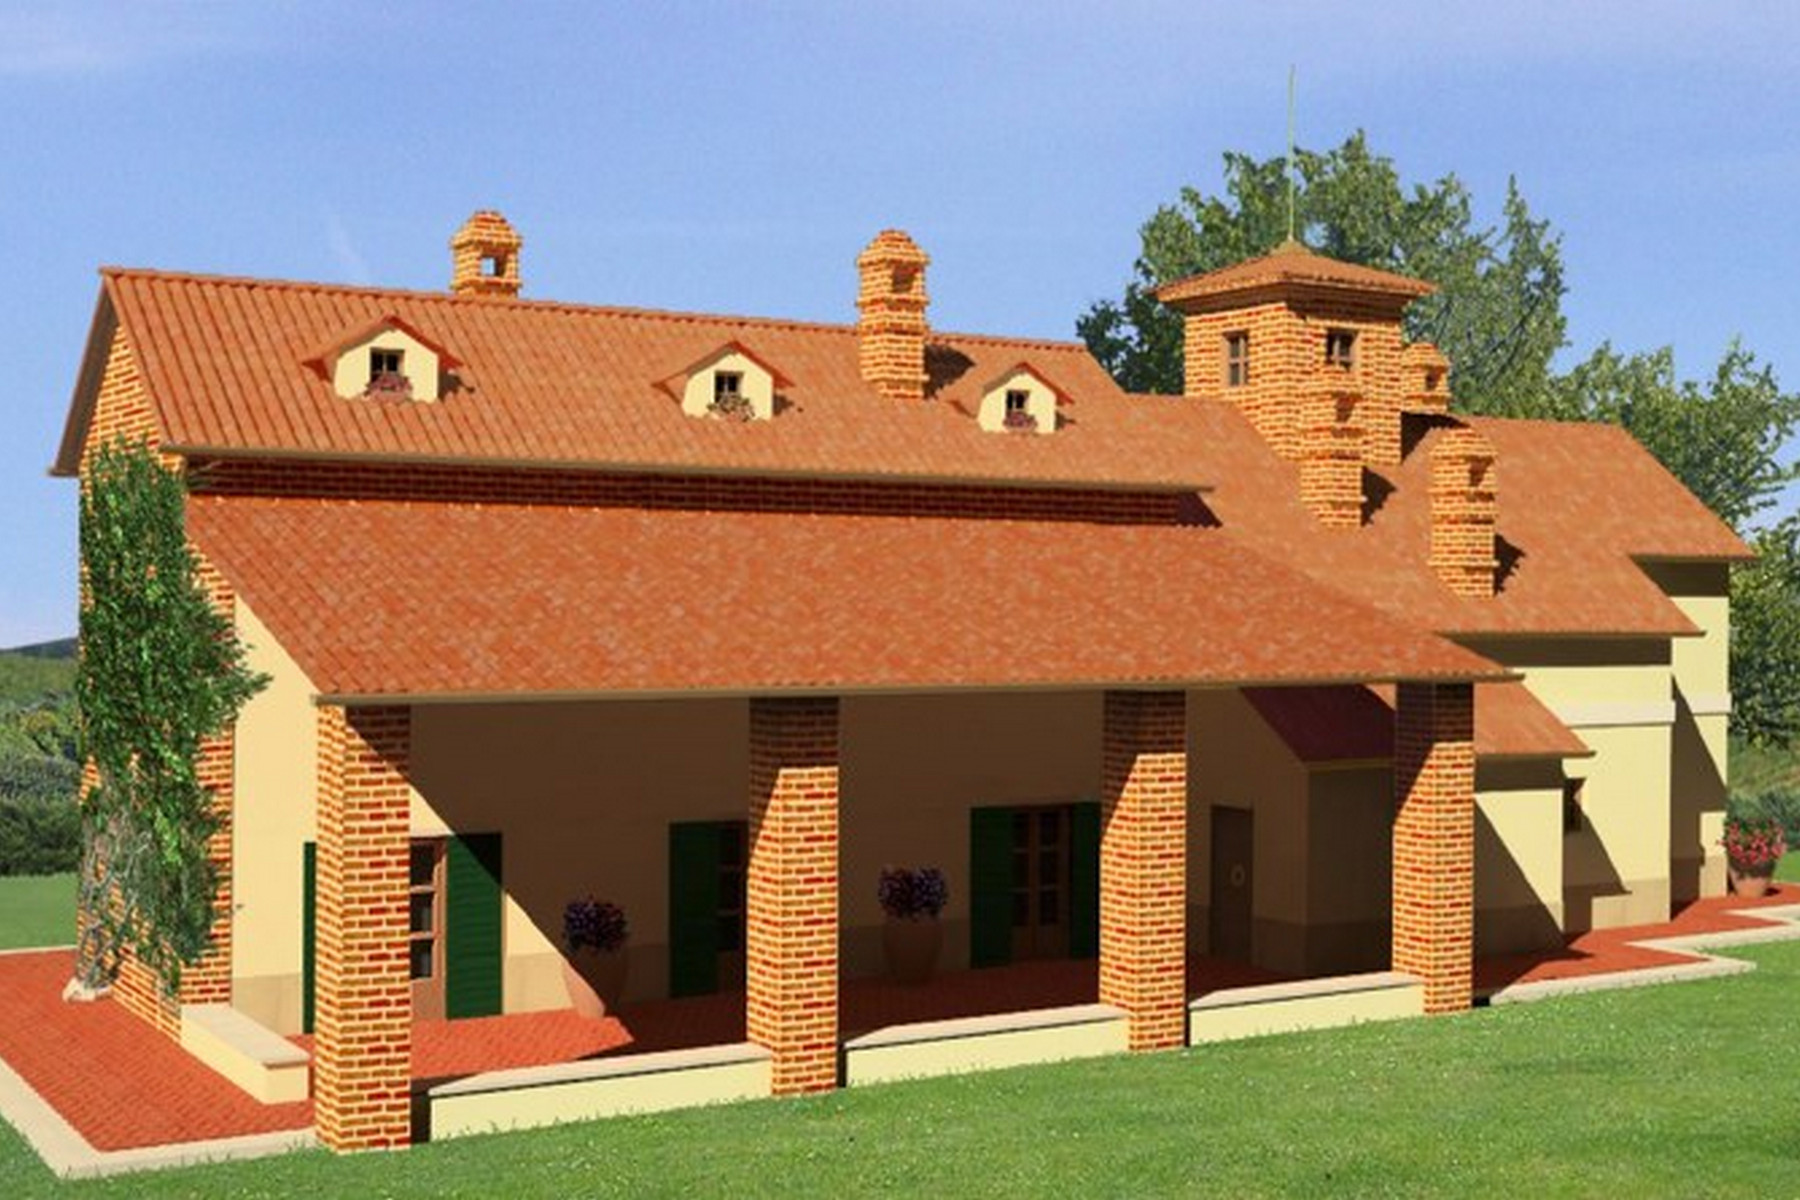 Rustico in Vendita a Novi Ligure: 5 locali, 300 mq - Foto 2